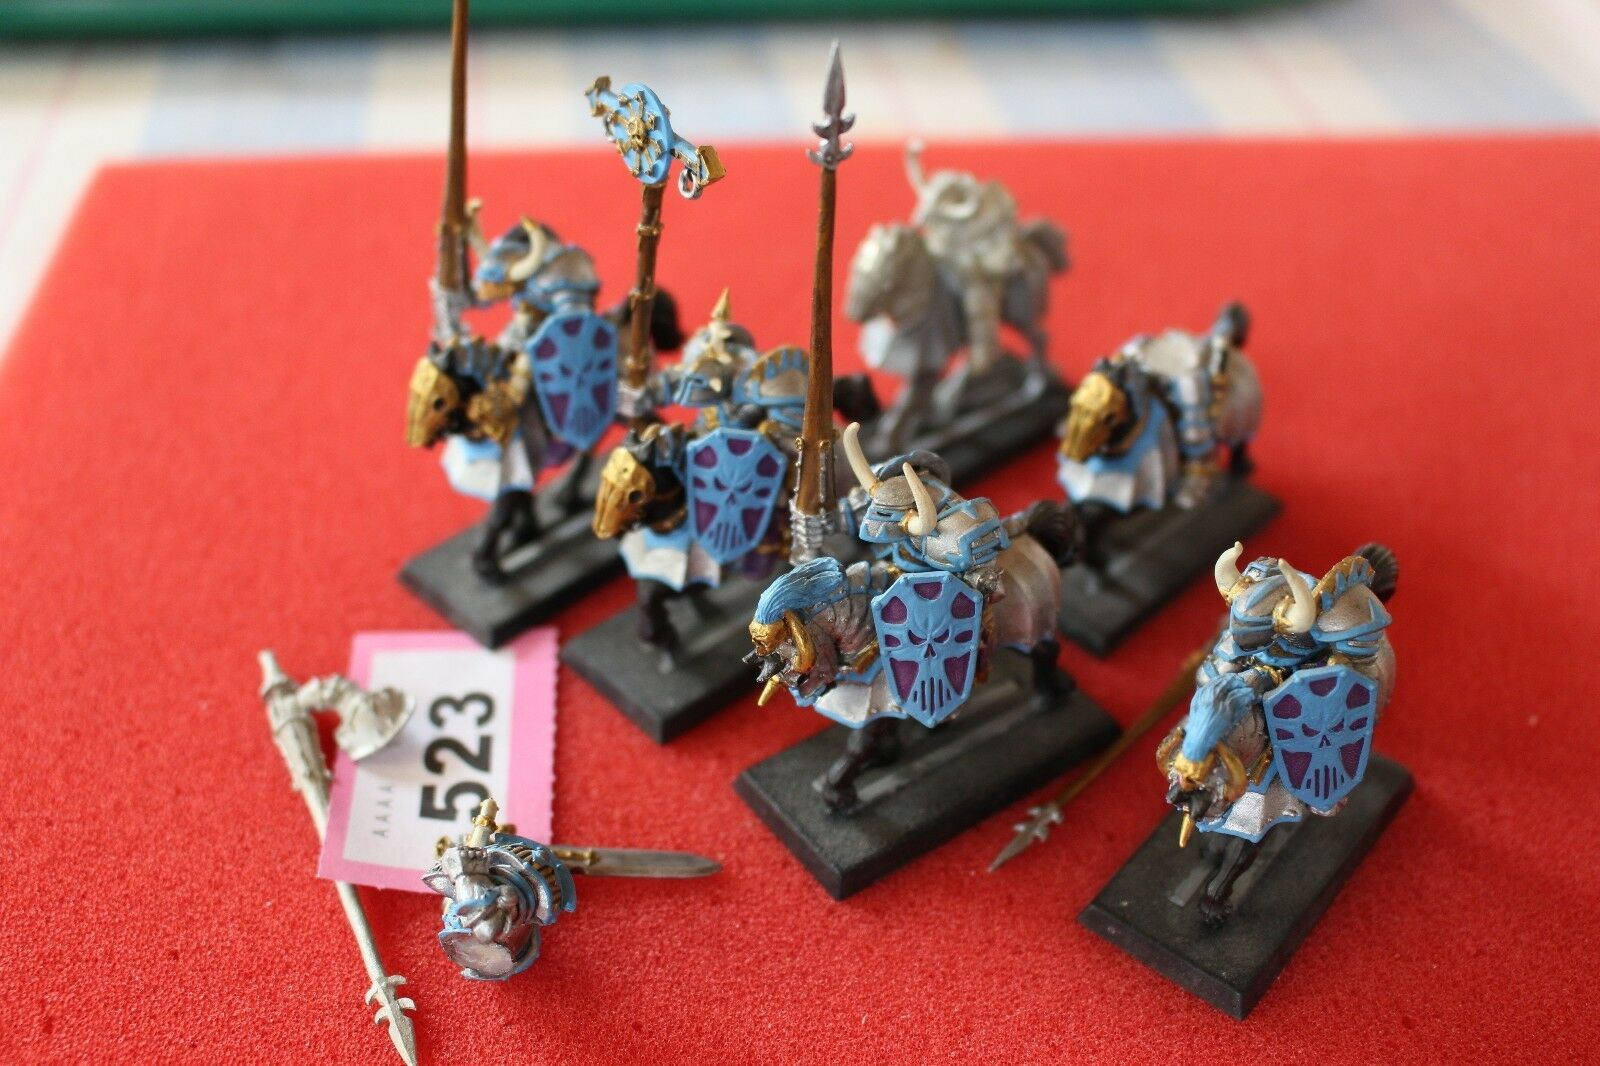 Warhammer chaos ritter x6 regiment metall - kunststoff - games workshop malte armee gw